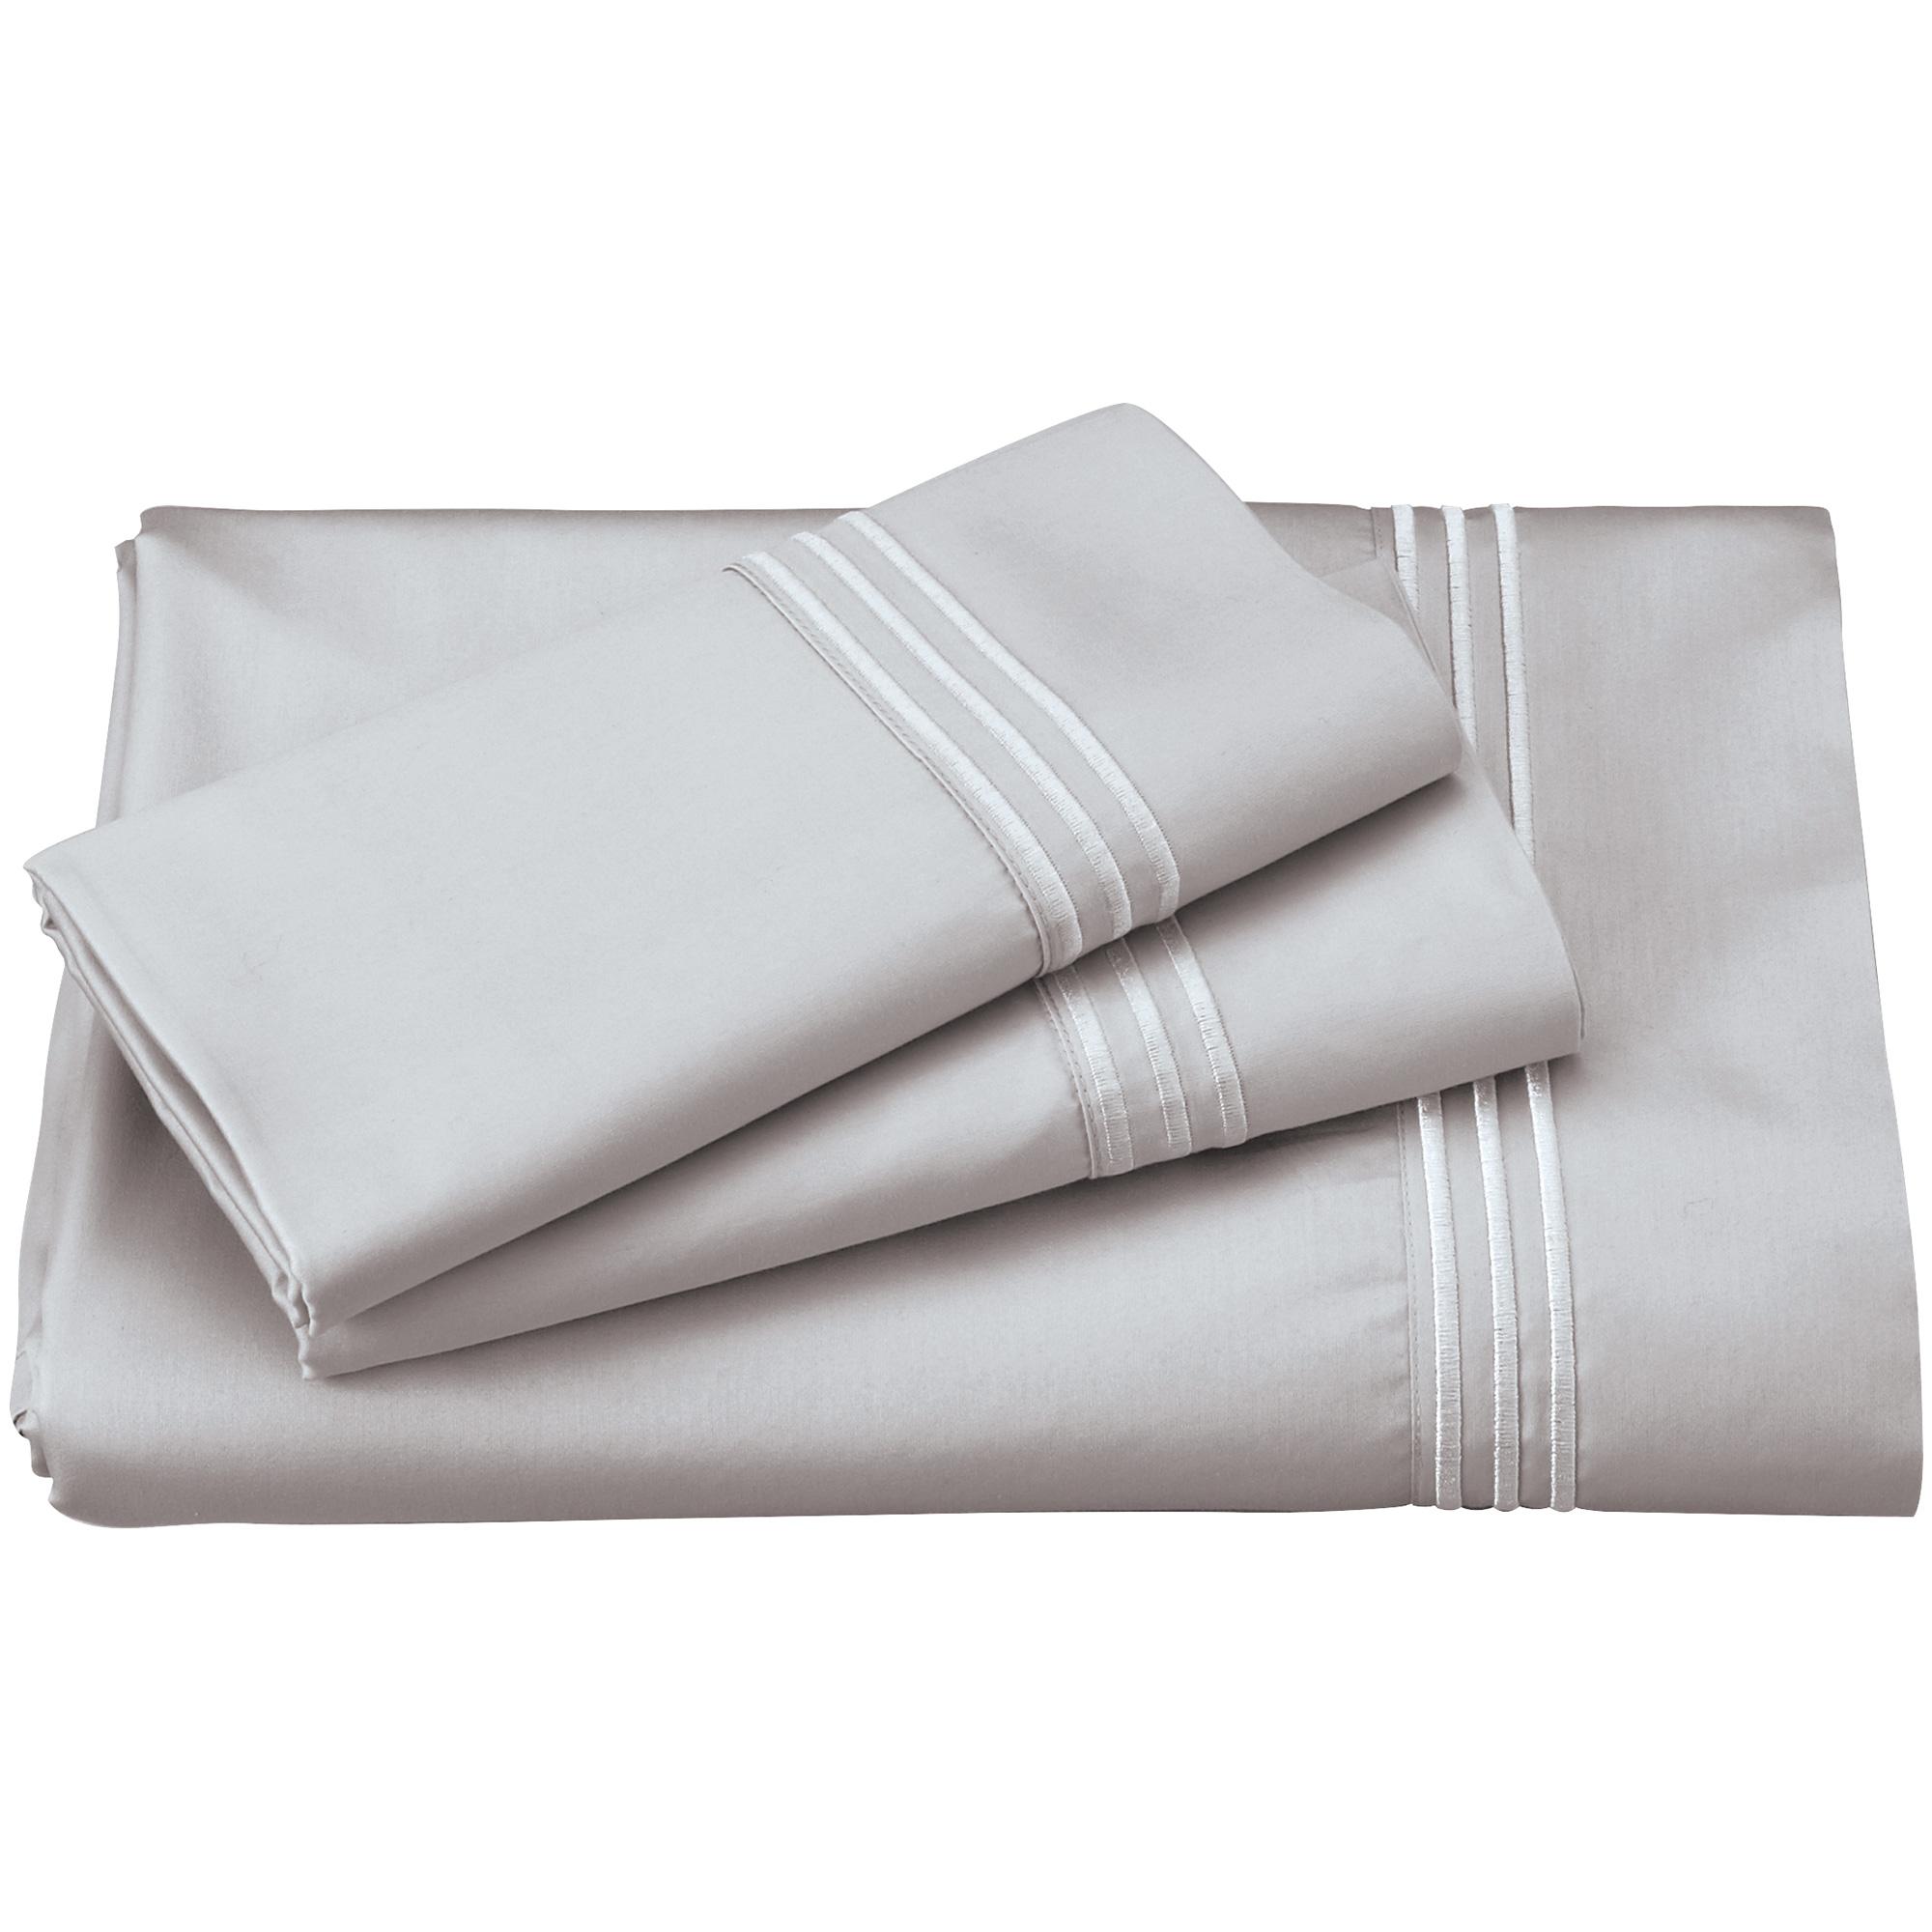 Purecare | Elements Dove Gray Queen Celliant Pillowcase